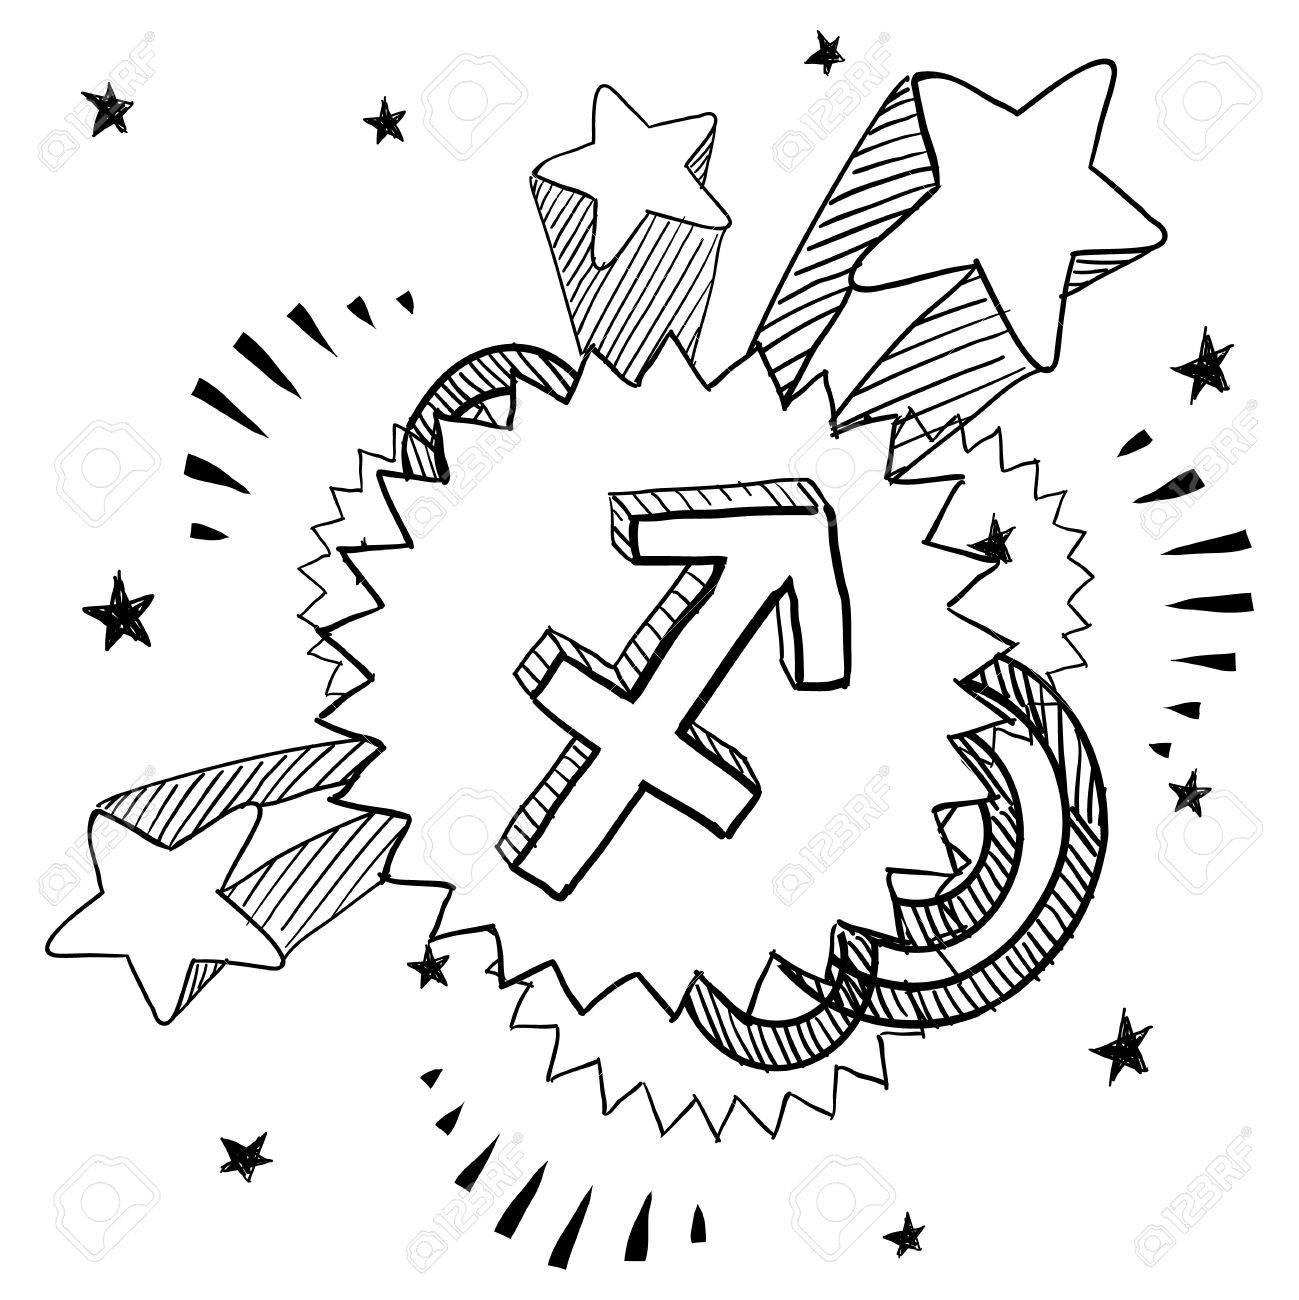 Doodle style zodiac astrology symbol on 1960s or 1970s pop doodle style zodiac astrology symbol on 1960s or 1970s pop explosion background sagittarius stock vector buycottarizona